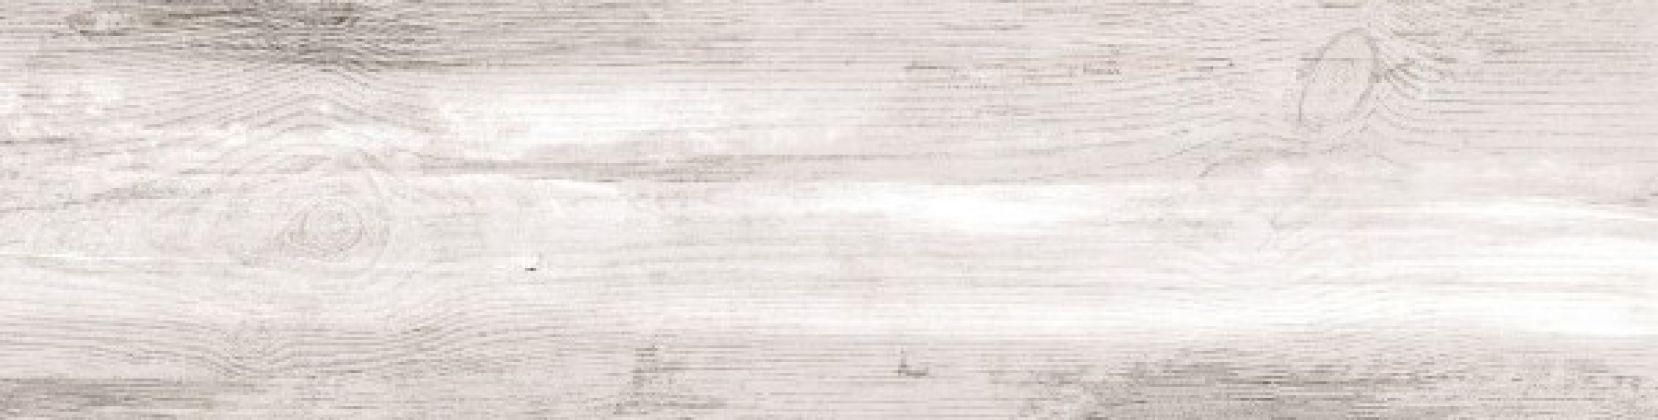 NAUTILUS Blanco Porc. 15,3x58,9